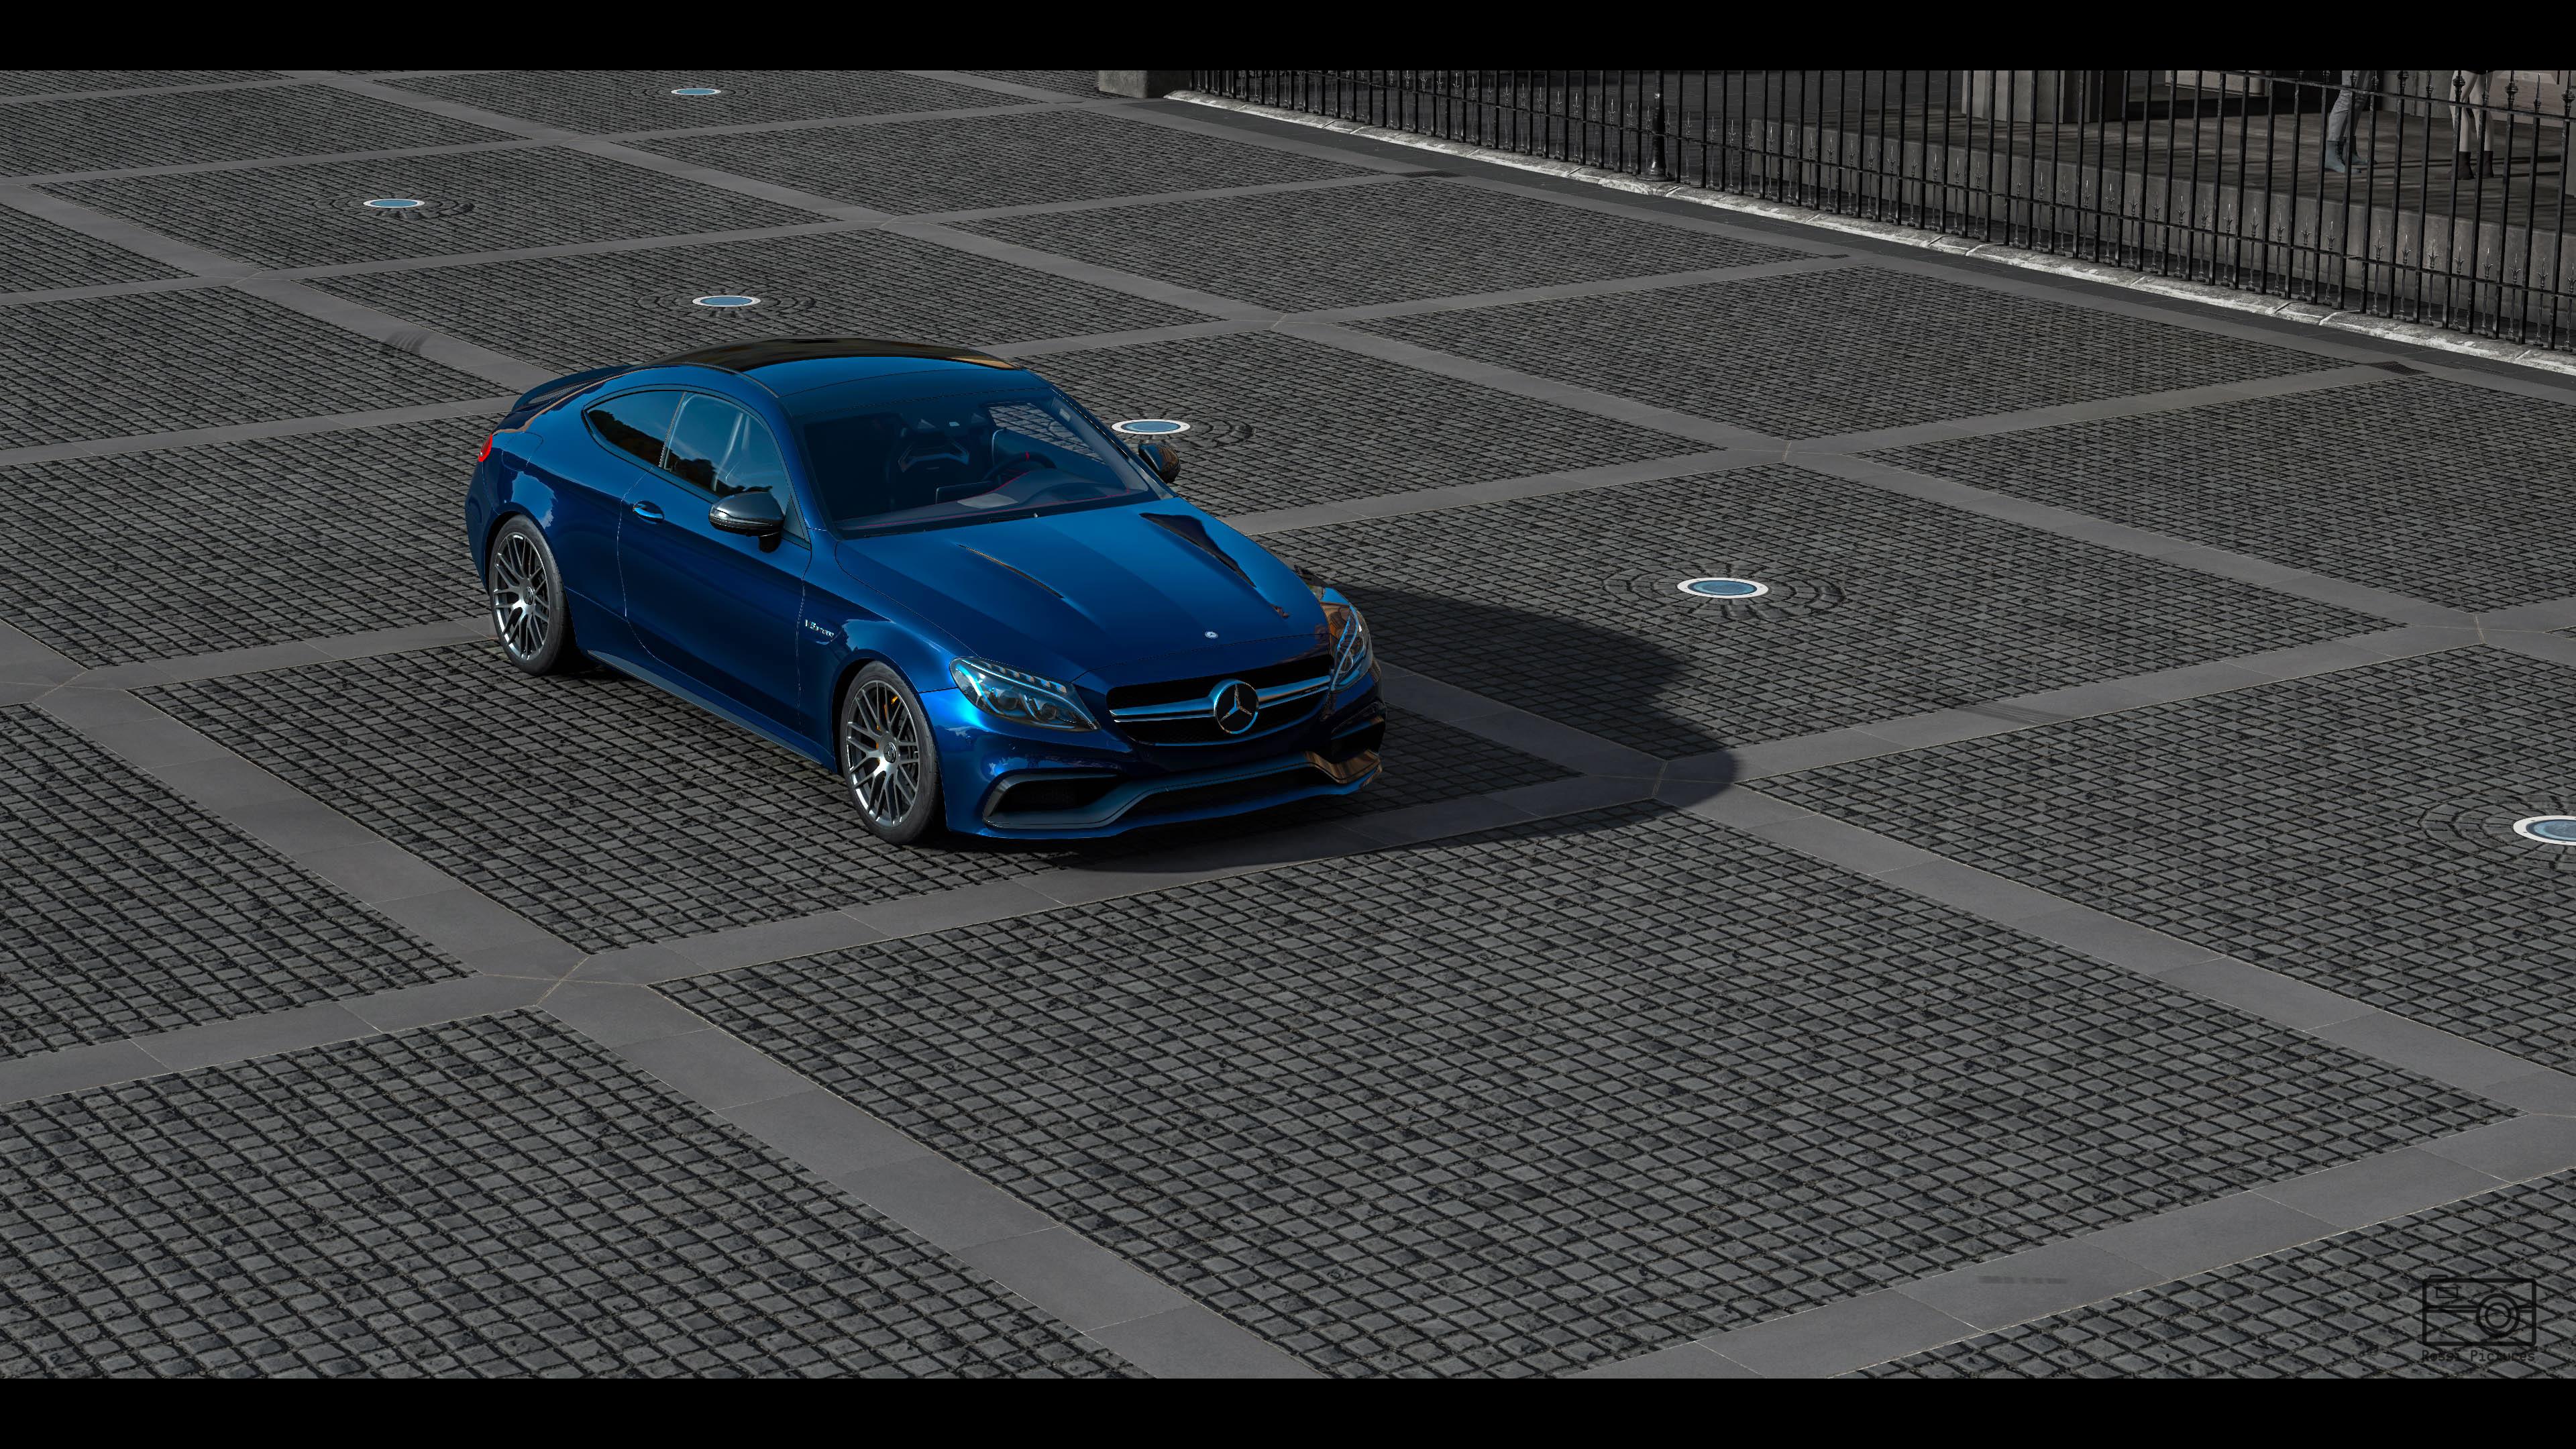 46515564951_85aa7cae0e_o ForzaMotorsport.fr